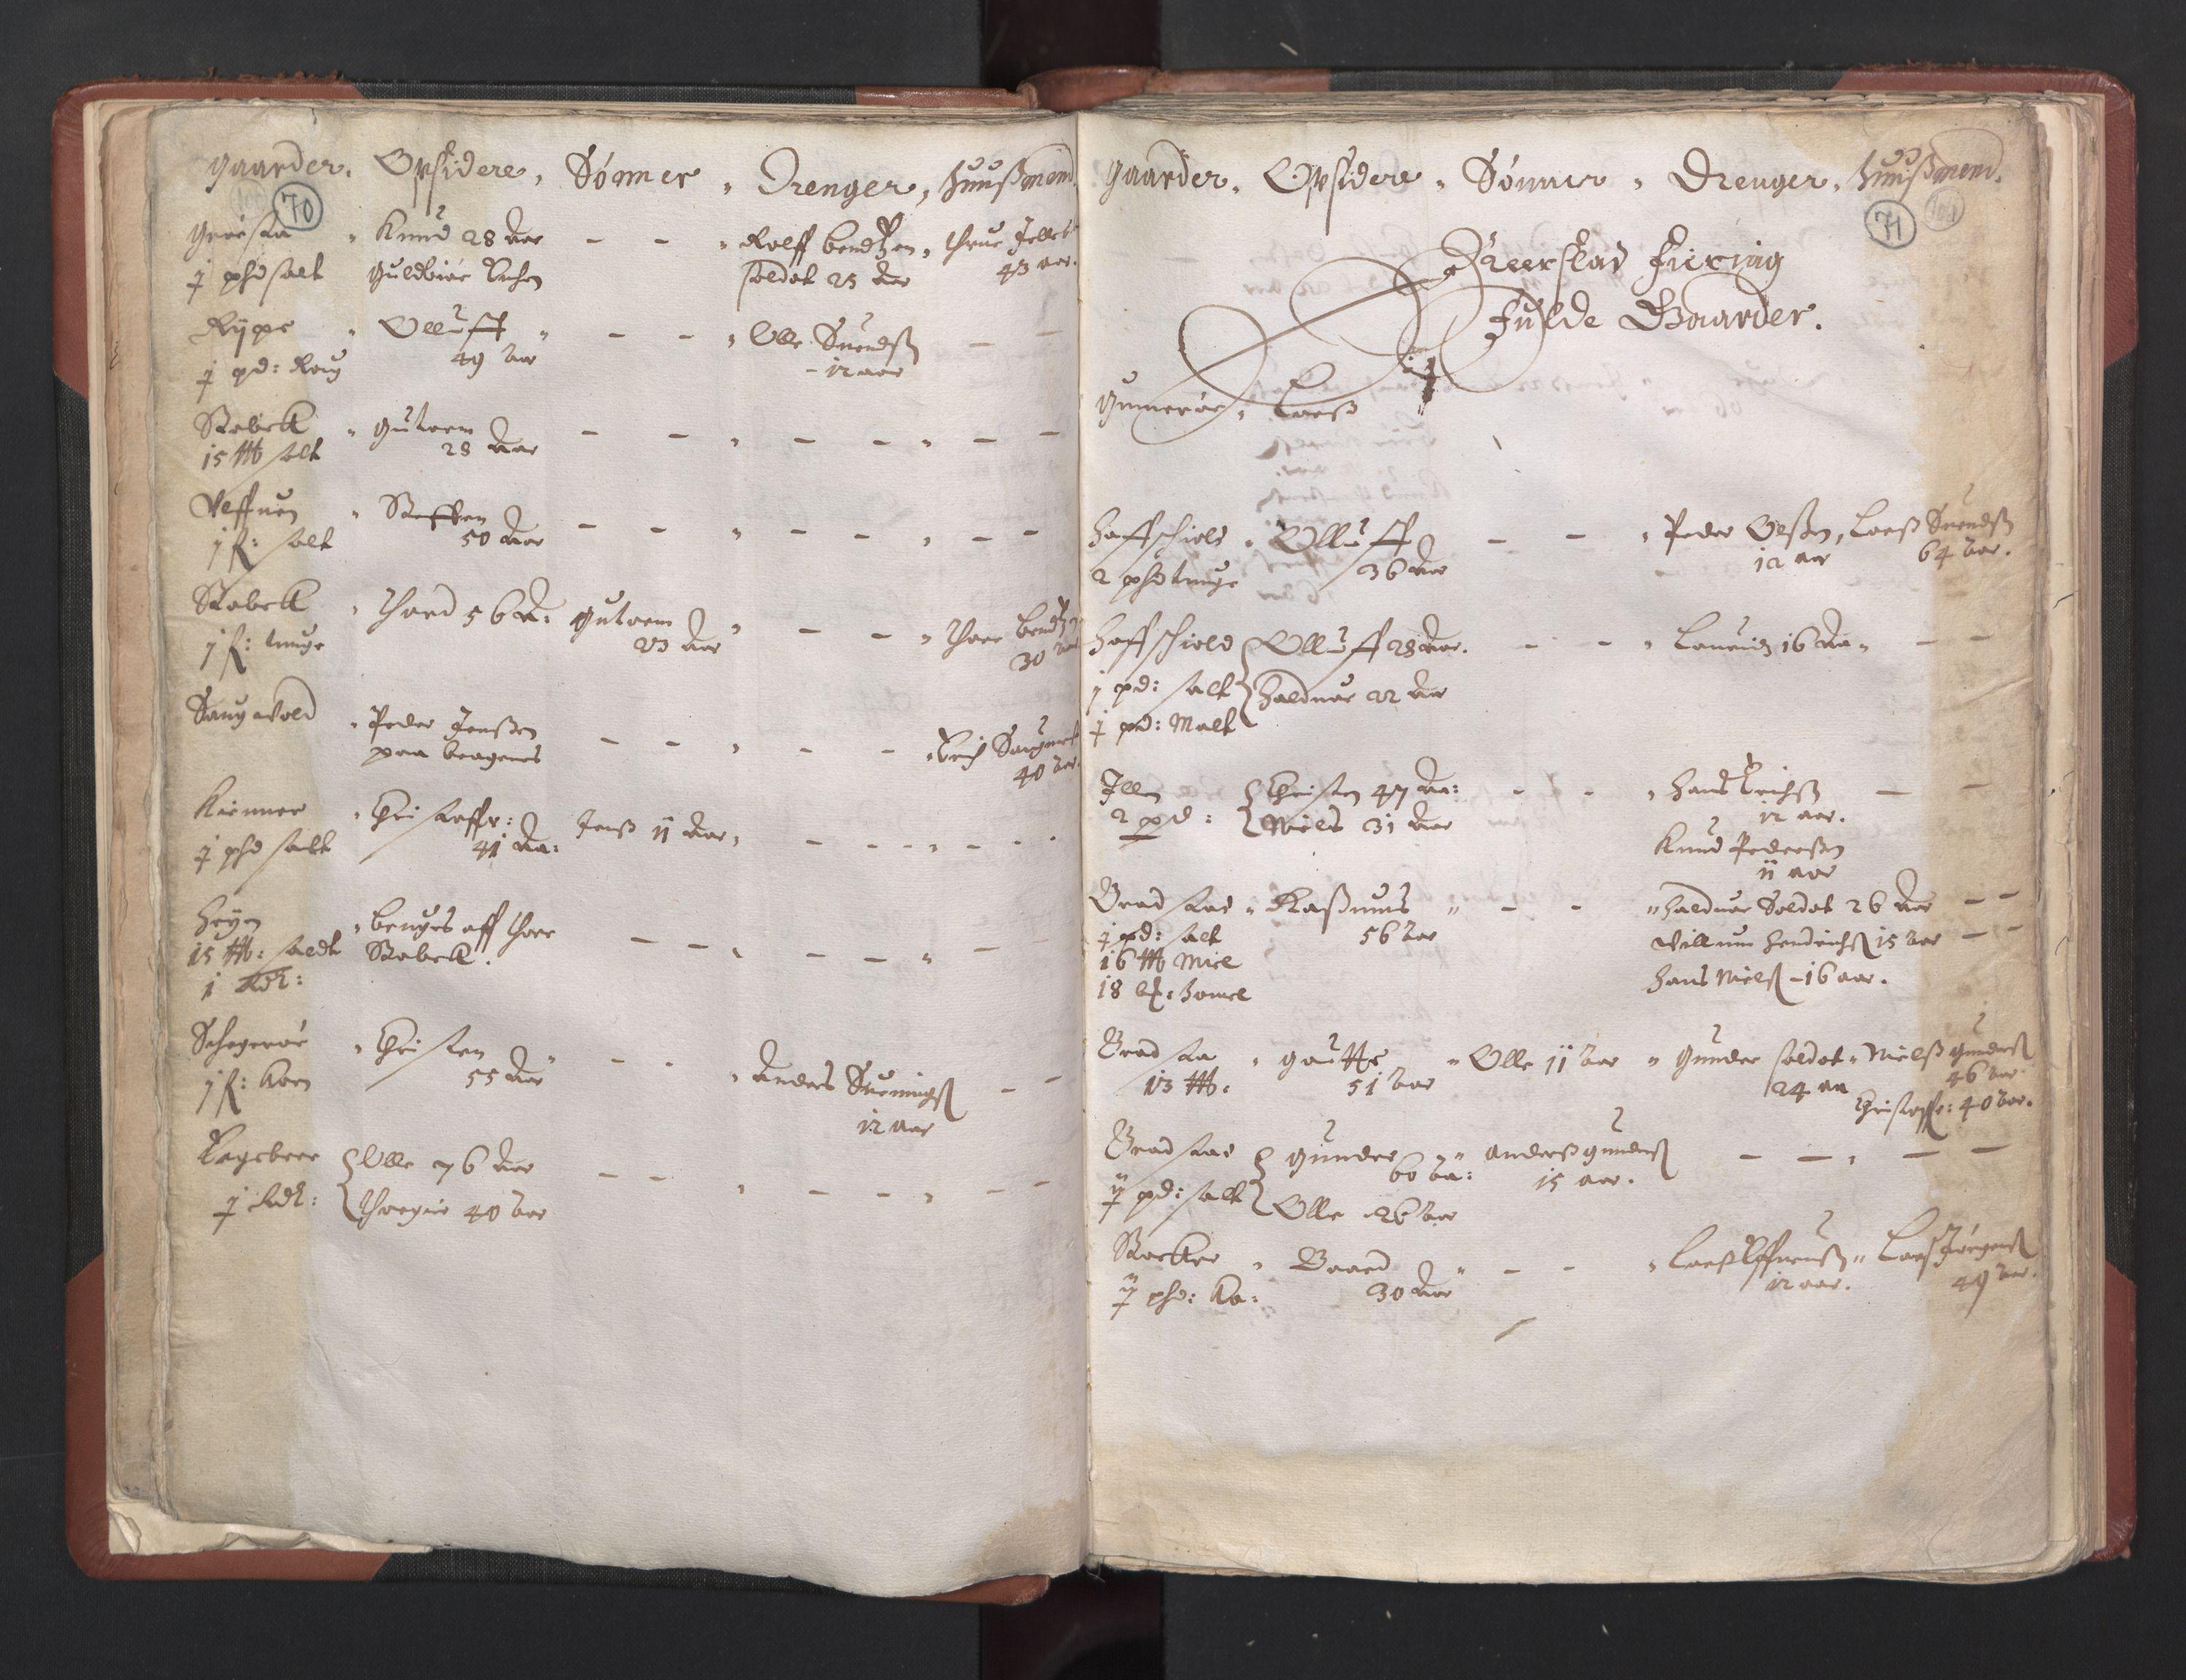 RA, Fogdenes og sorenskrivernes manntall 1664-1666, nr. 5: Fogderier (len og skipreider) i nåværende Buskerud fylke og Vestfold fylke, 1664, s. 70-71